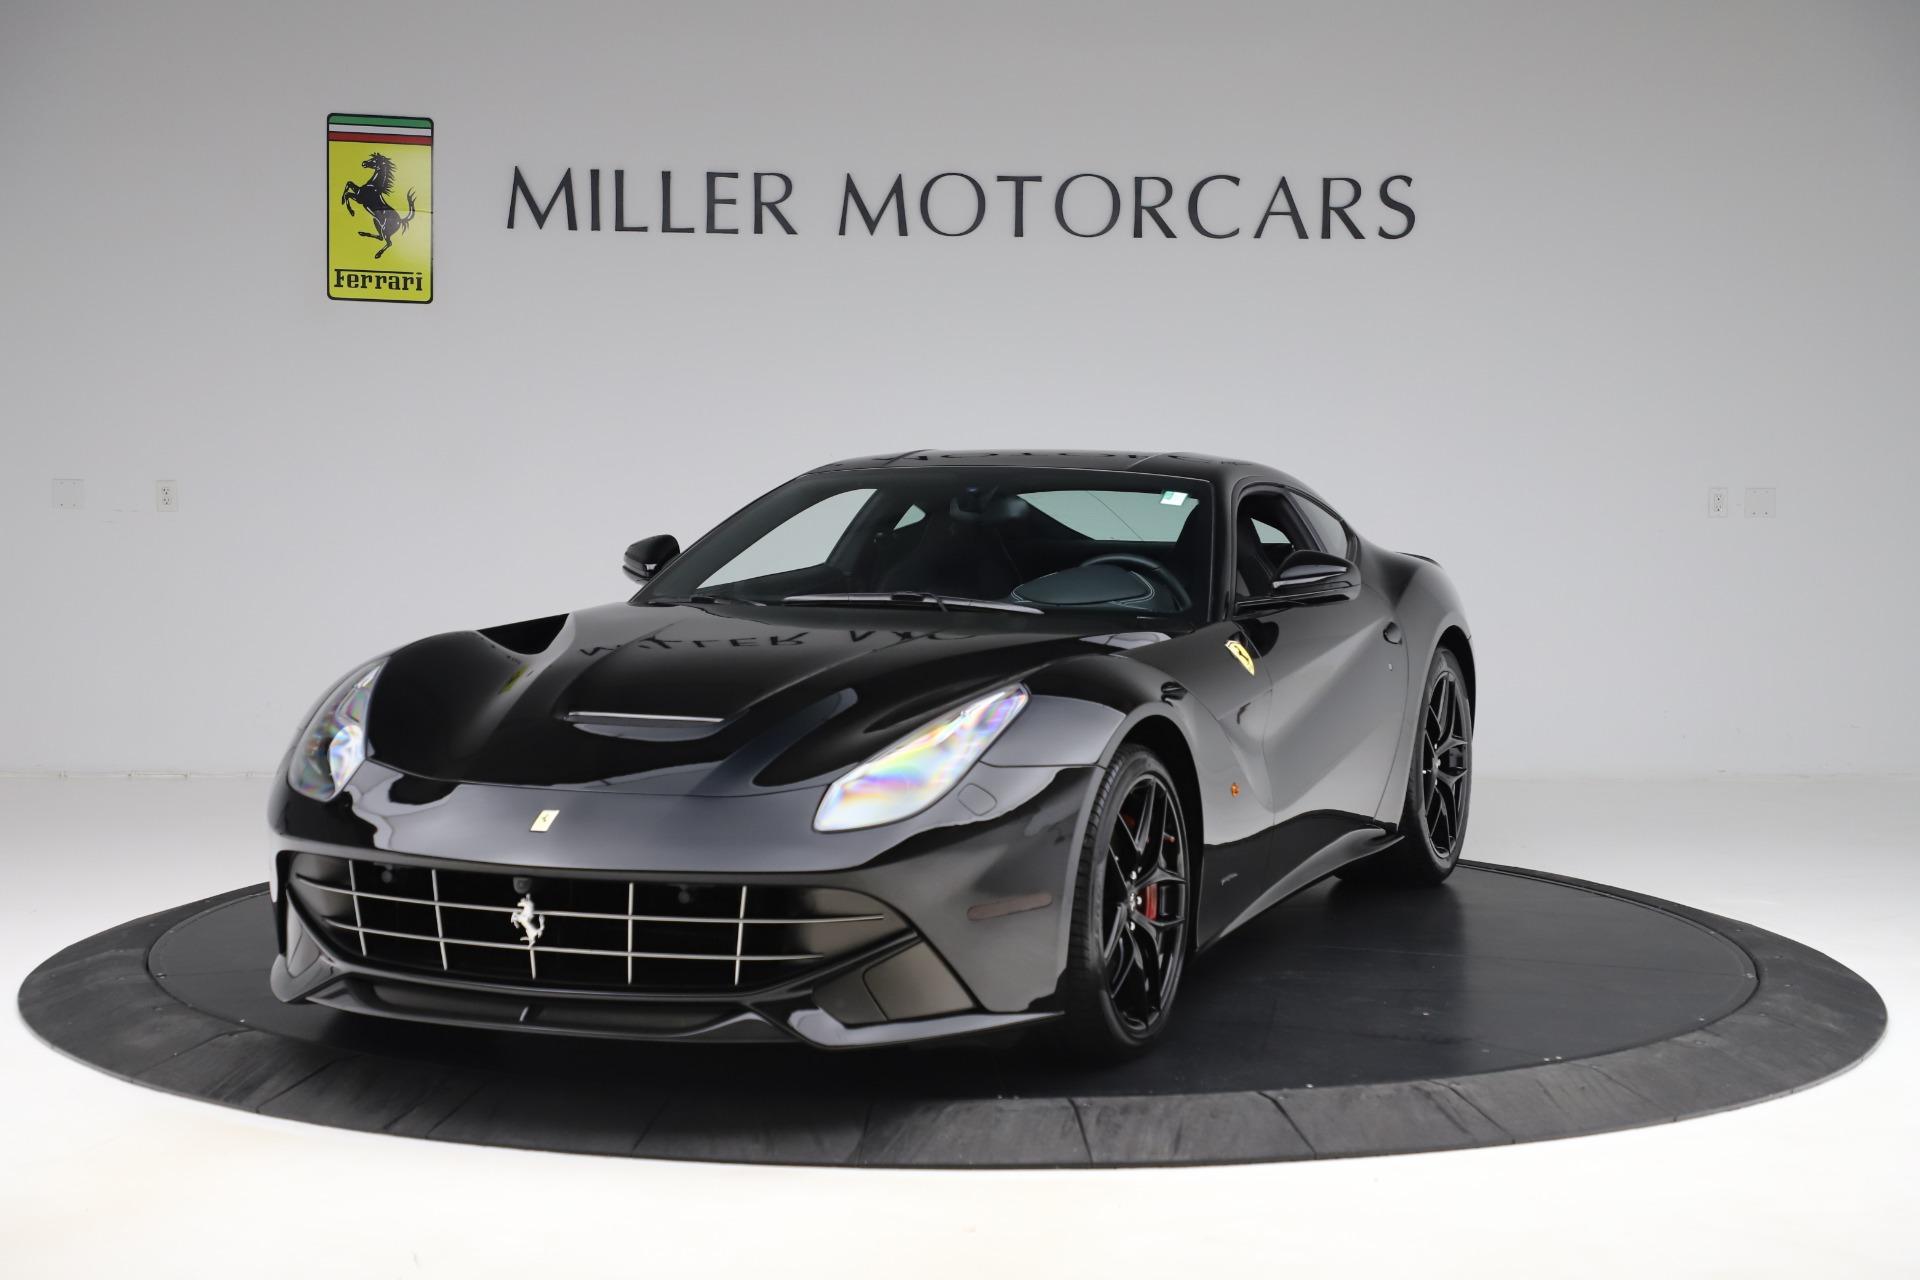 Used 2016 Ferrari F12 Berlinetta for sale Sold at Maserati of Westport in Westport CT 06880 1